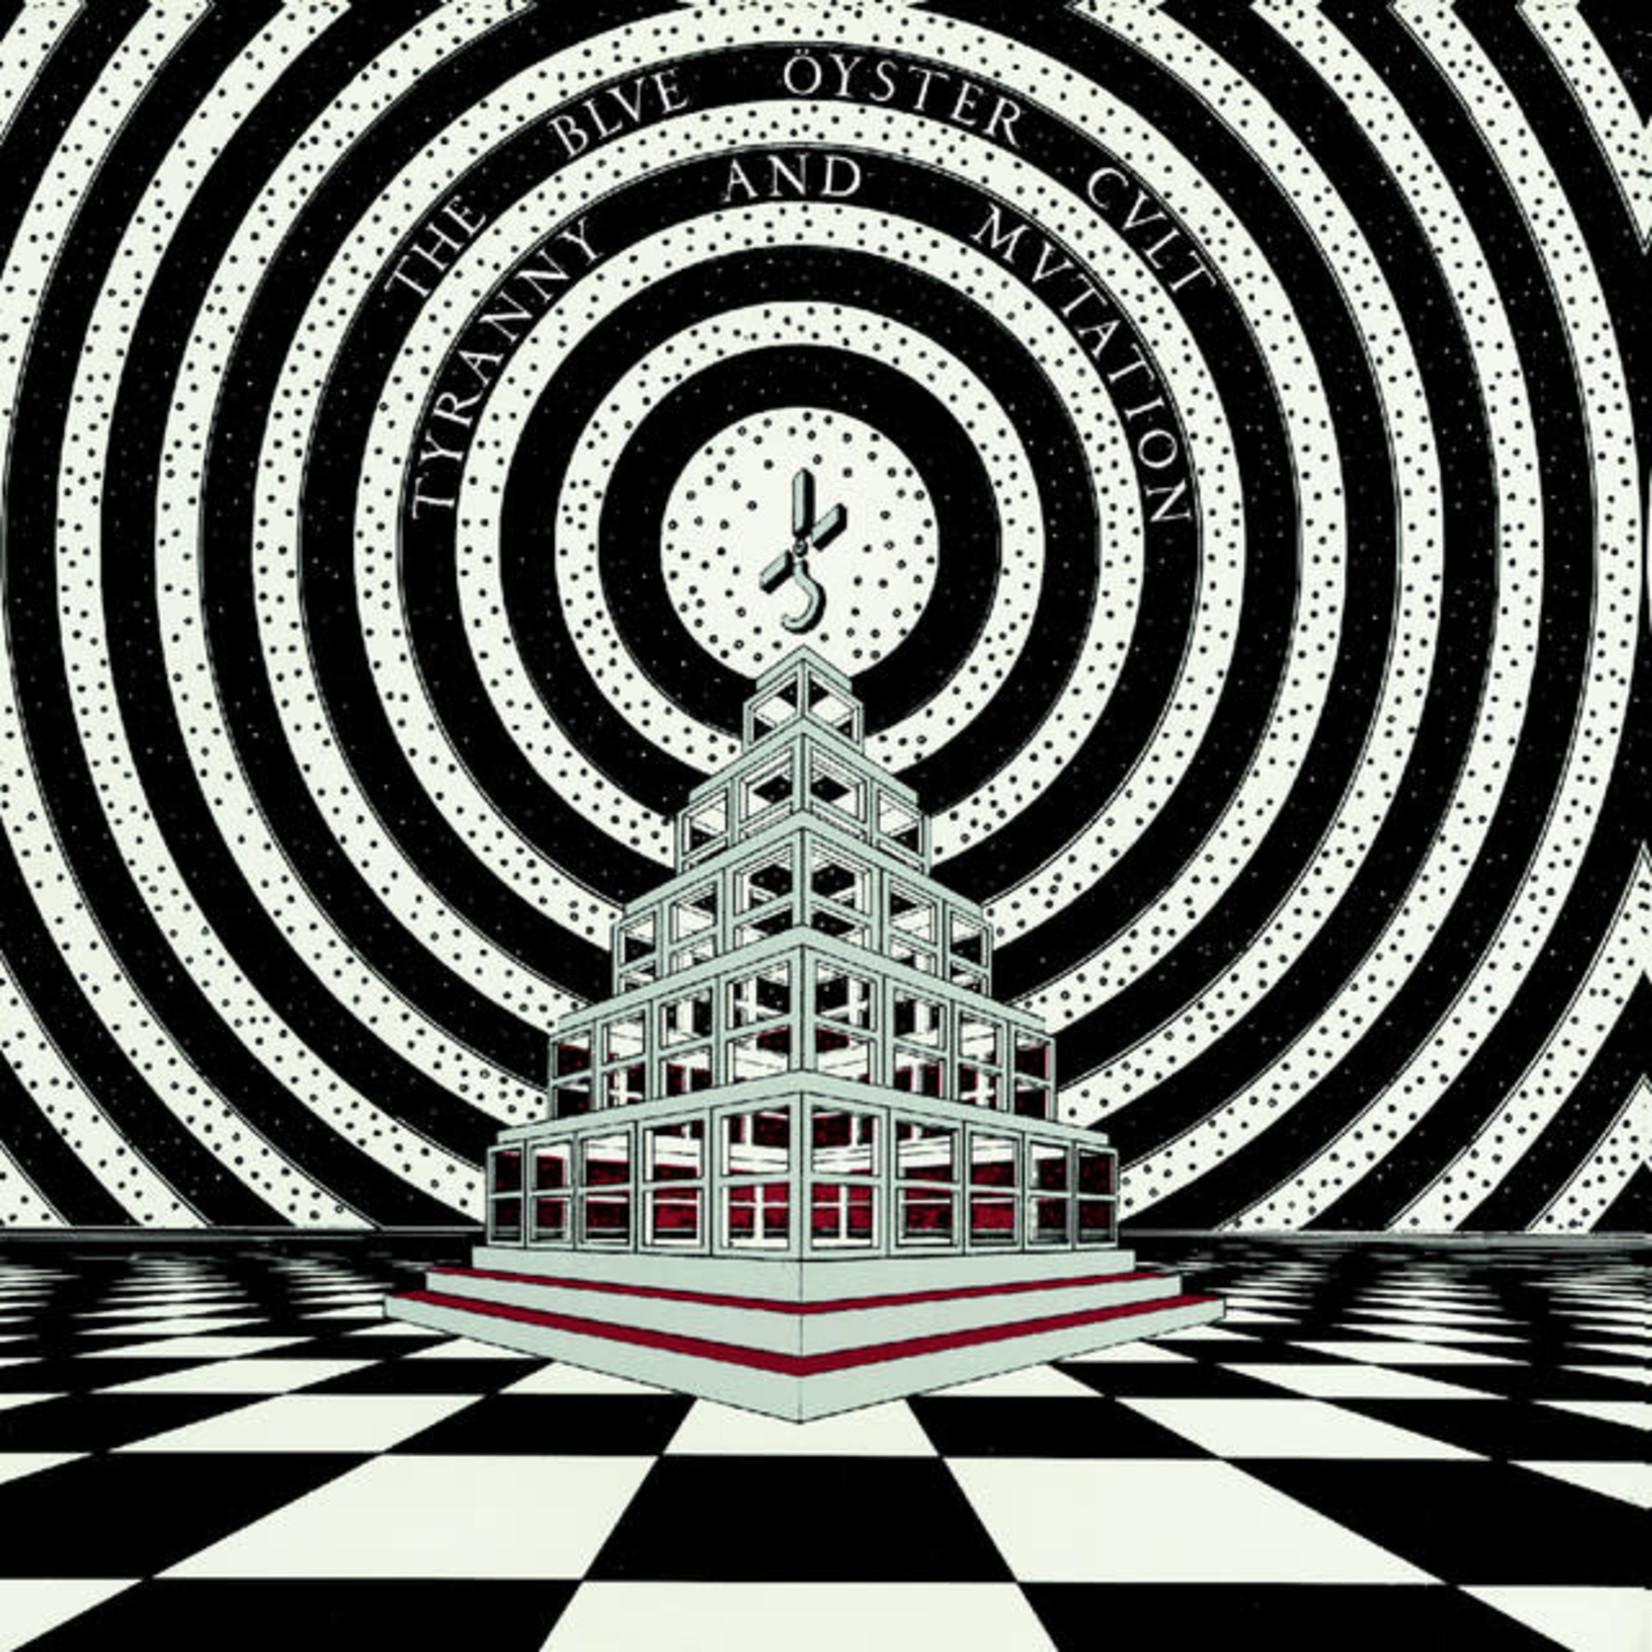 Vinyl Blue Oyster Cult - Tranny And Mutation   (Audiophile - Speakers Corner)